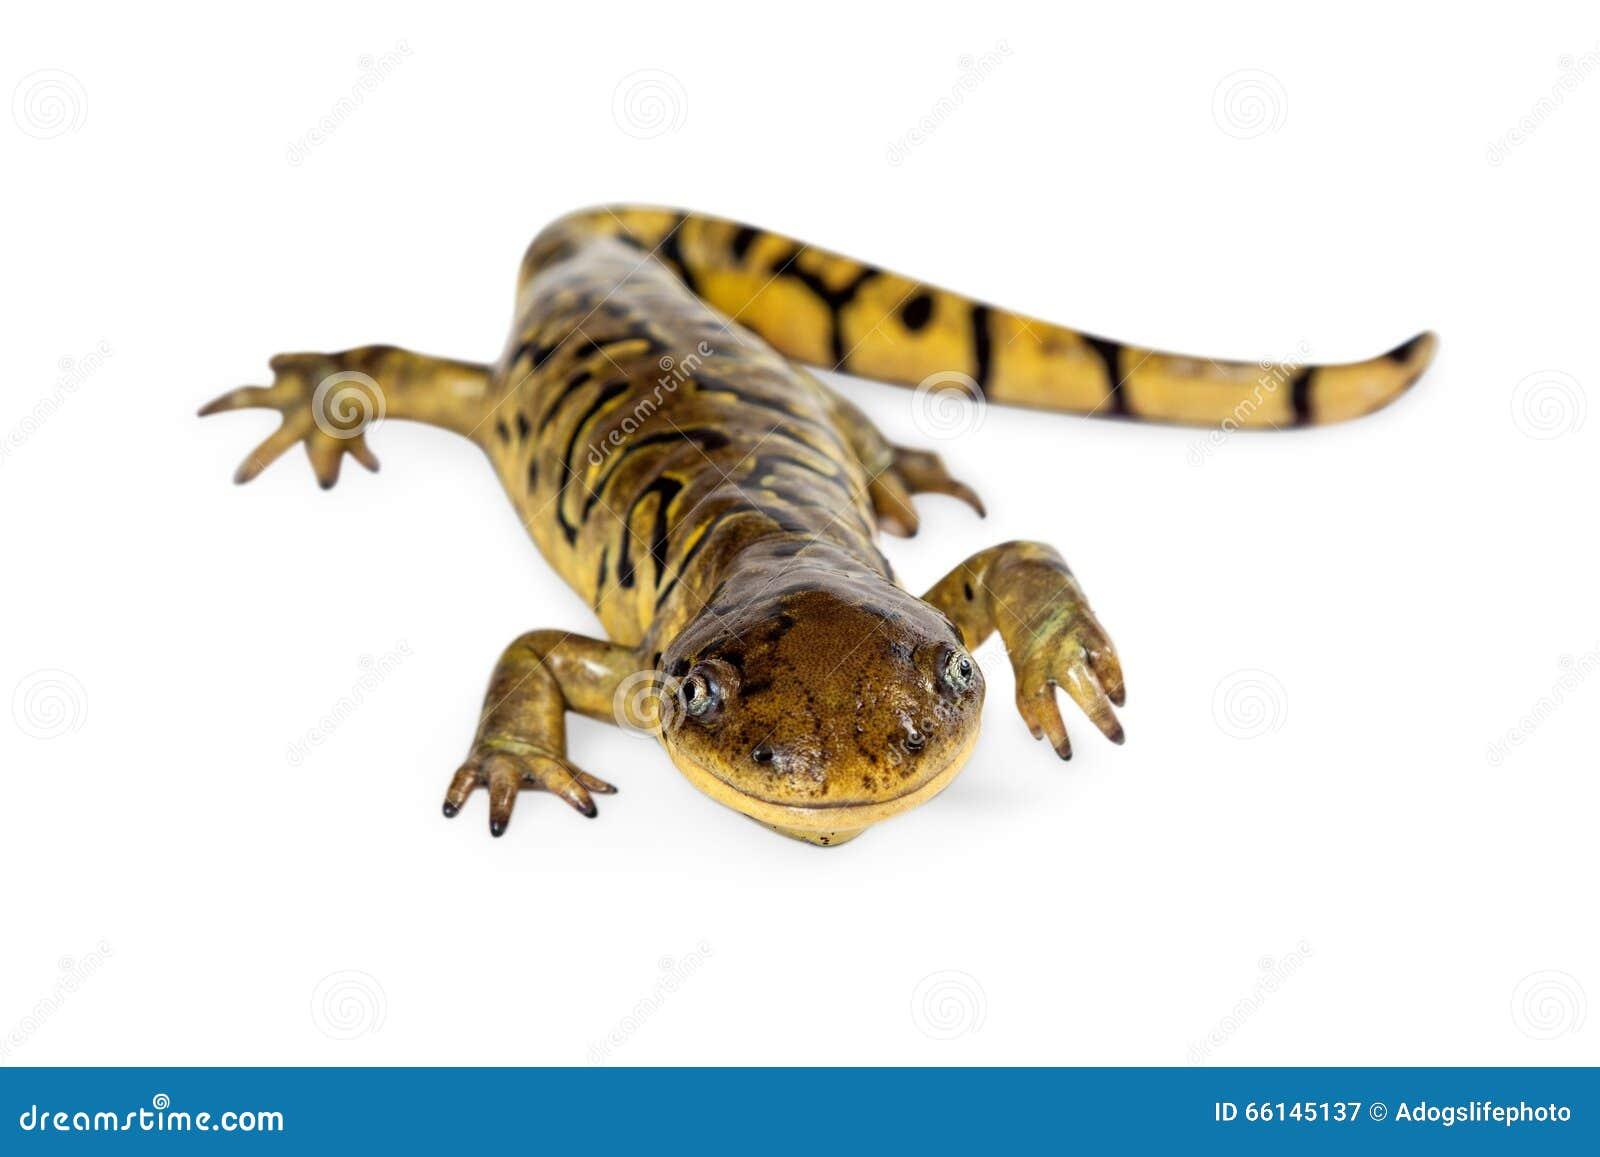 salamander white background - photo #36